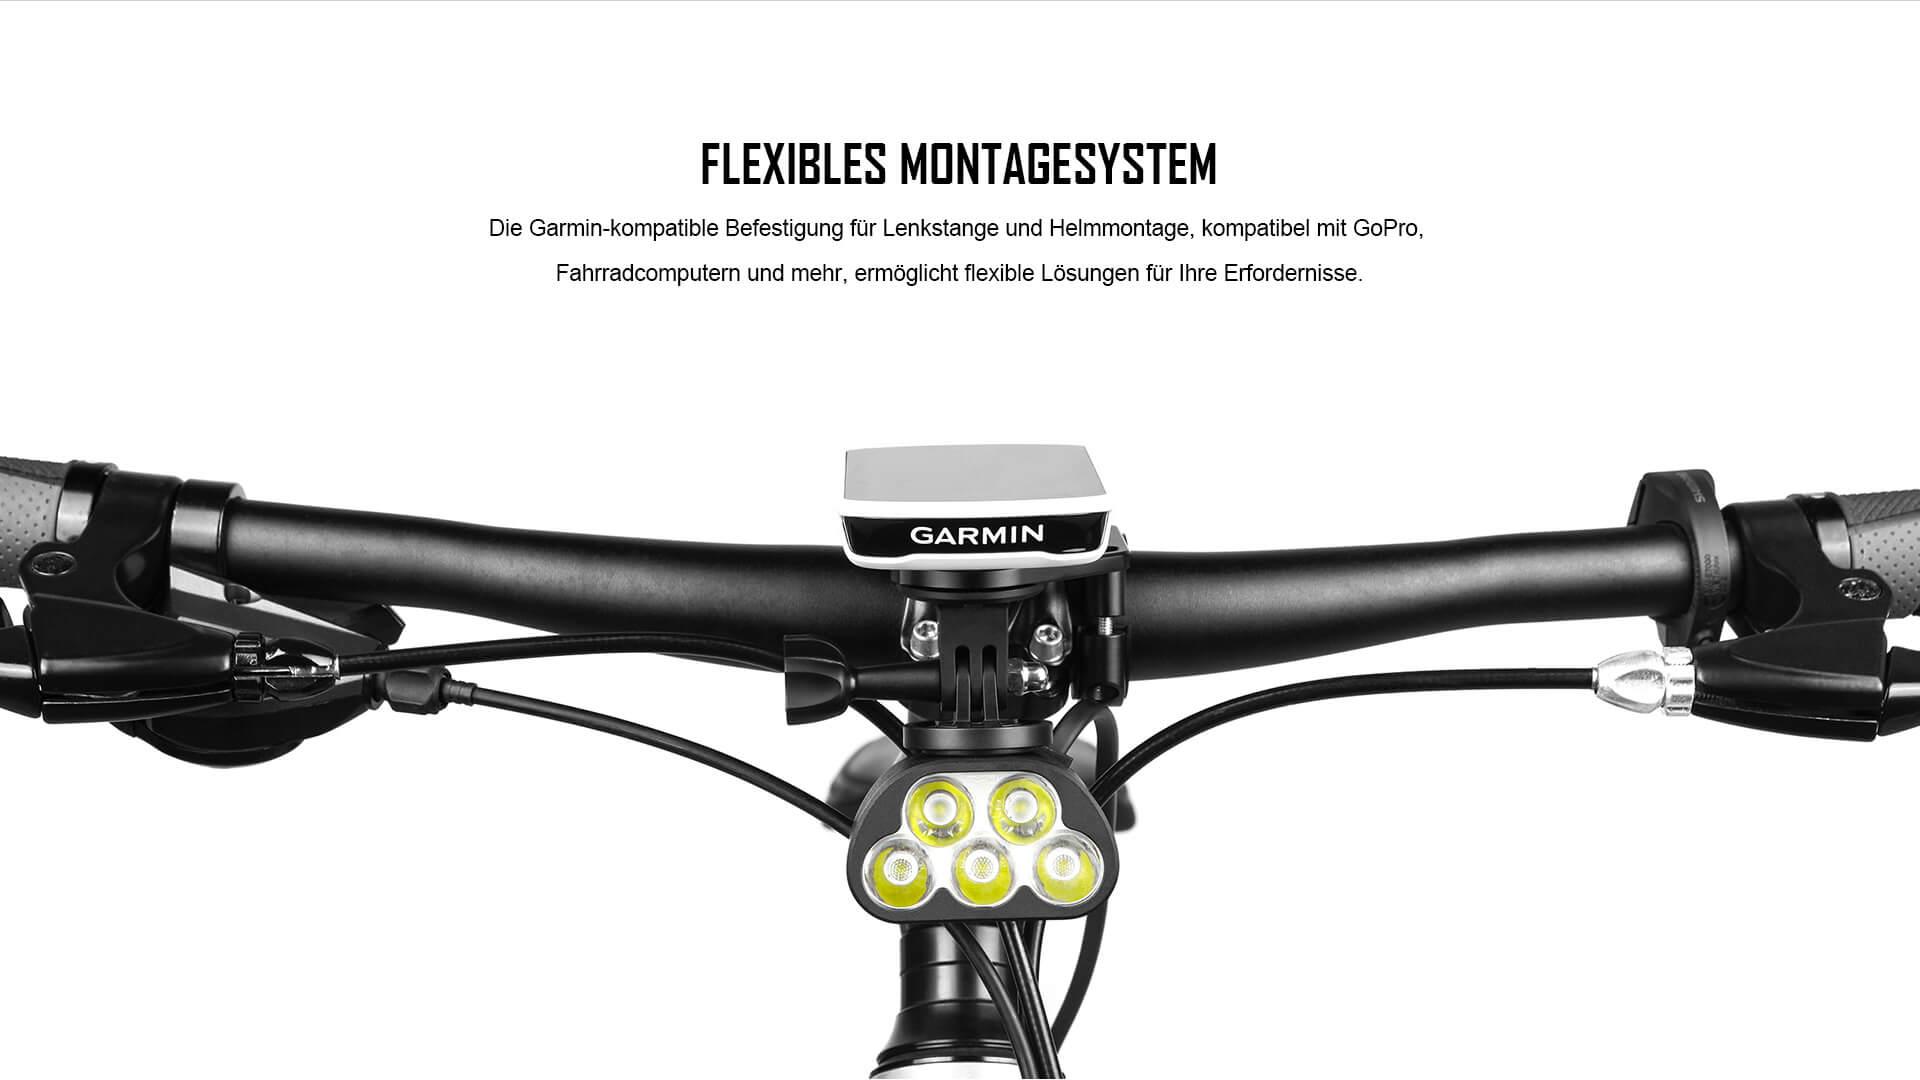 Flexibles Montagesystem